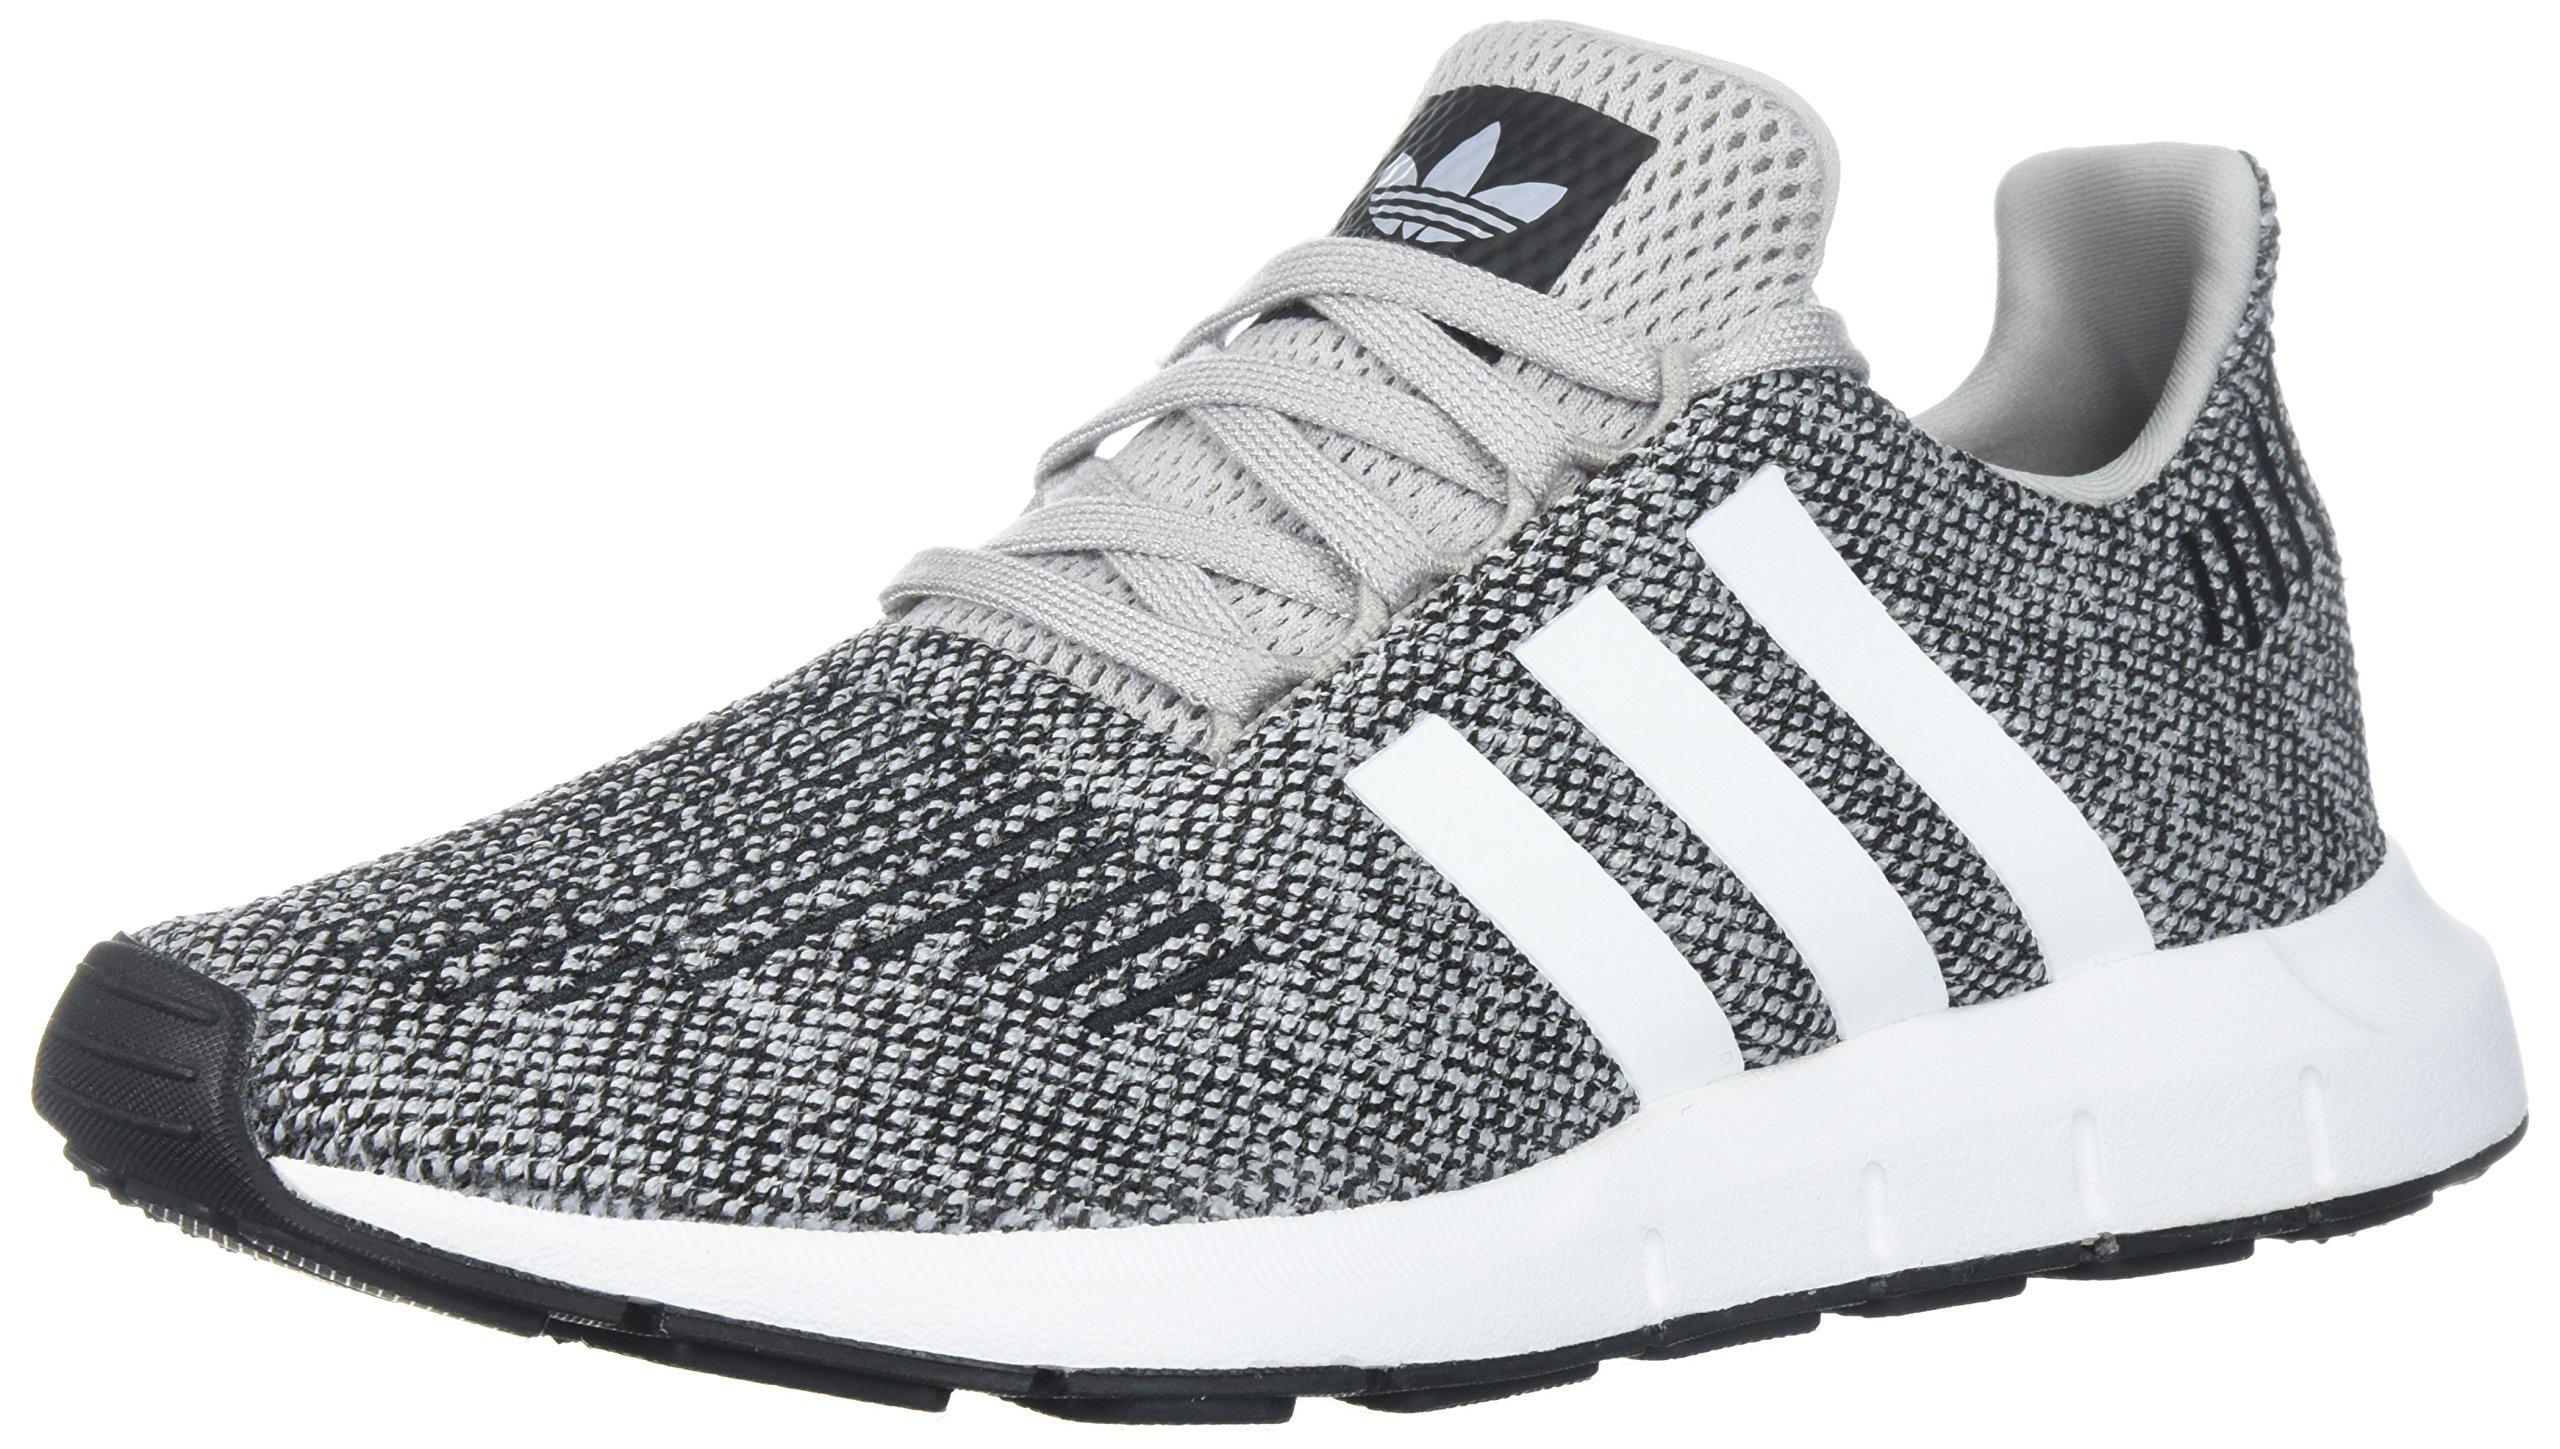 49f4da228d7 Galleon - Adidas Originals Boys  Swift J Running Shoe